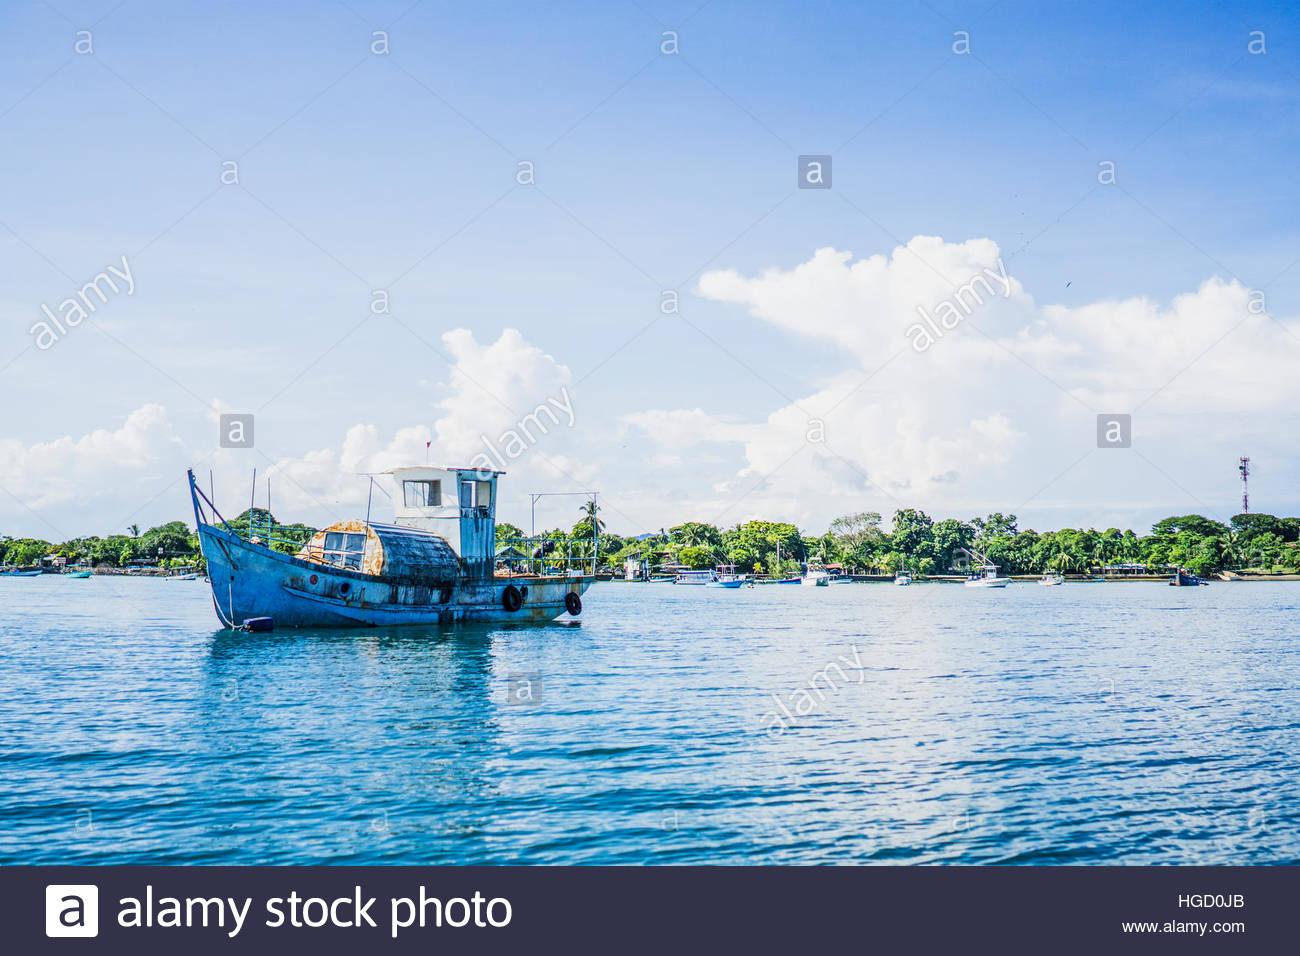 Puerto Jimenez Harbour, Osa Peninsula, Costa rica, Central America 2015 - Stock Image